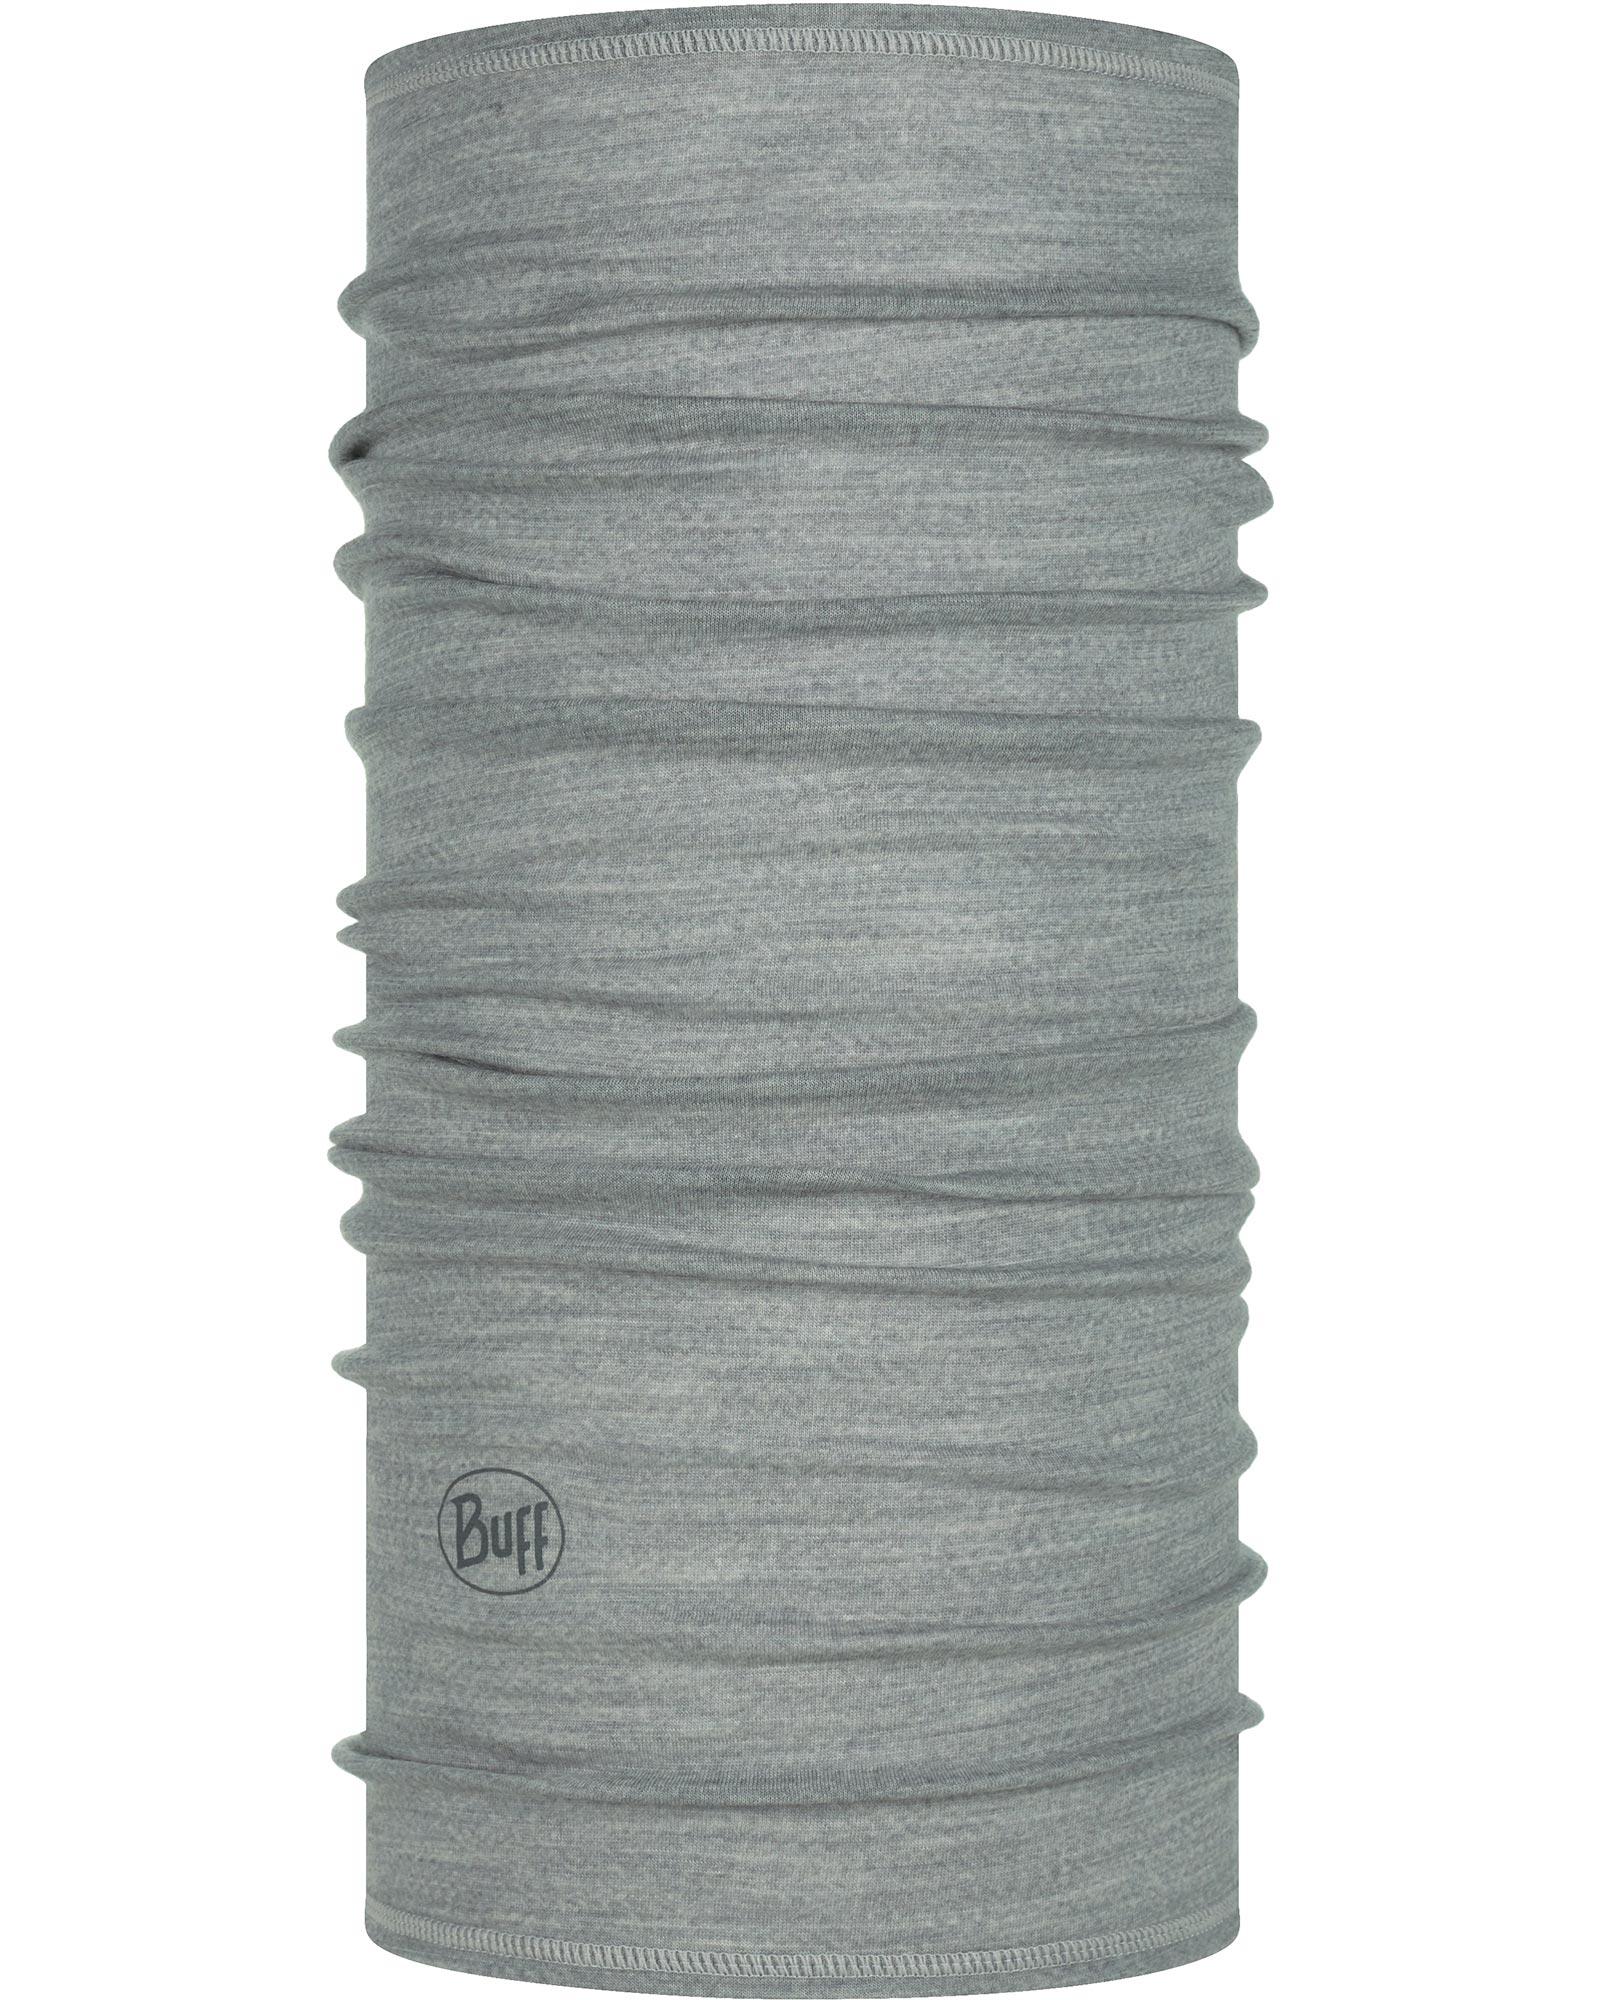 Buff Polar Adult - Cashmere Black Neck Warmer